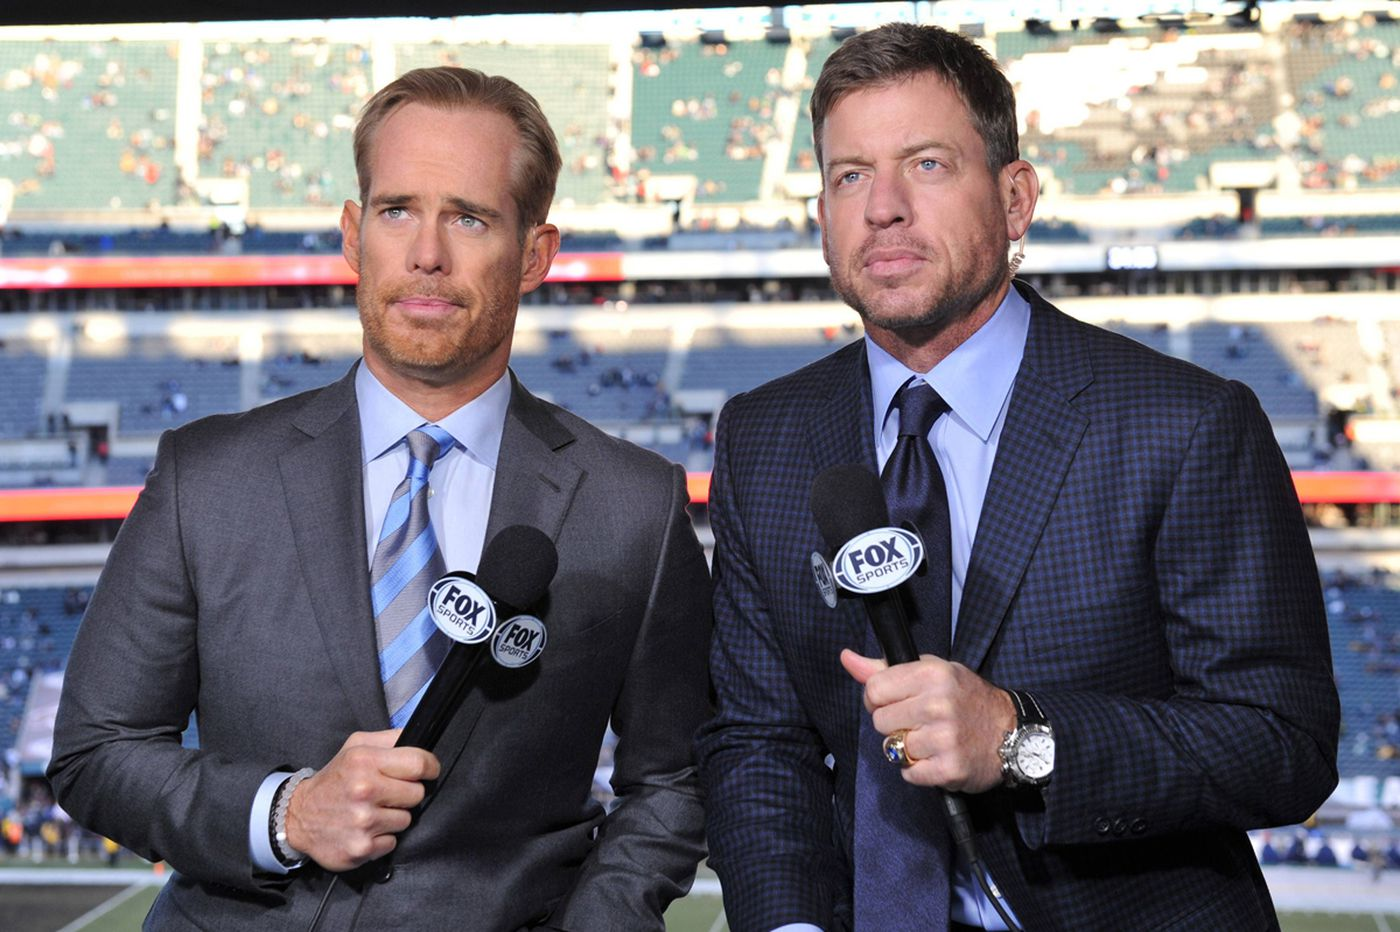 Joe Buck and Troy Aikman Super Bowl broadcast prop bets